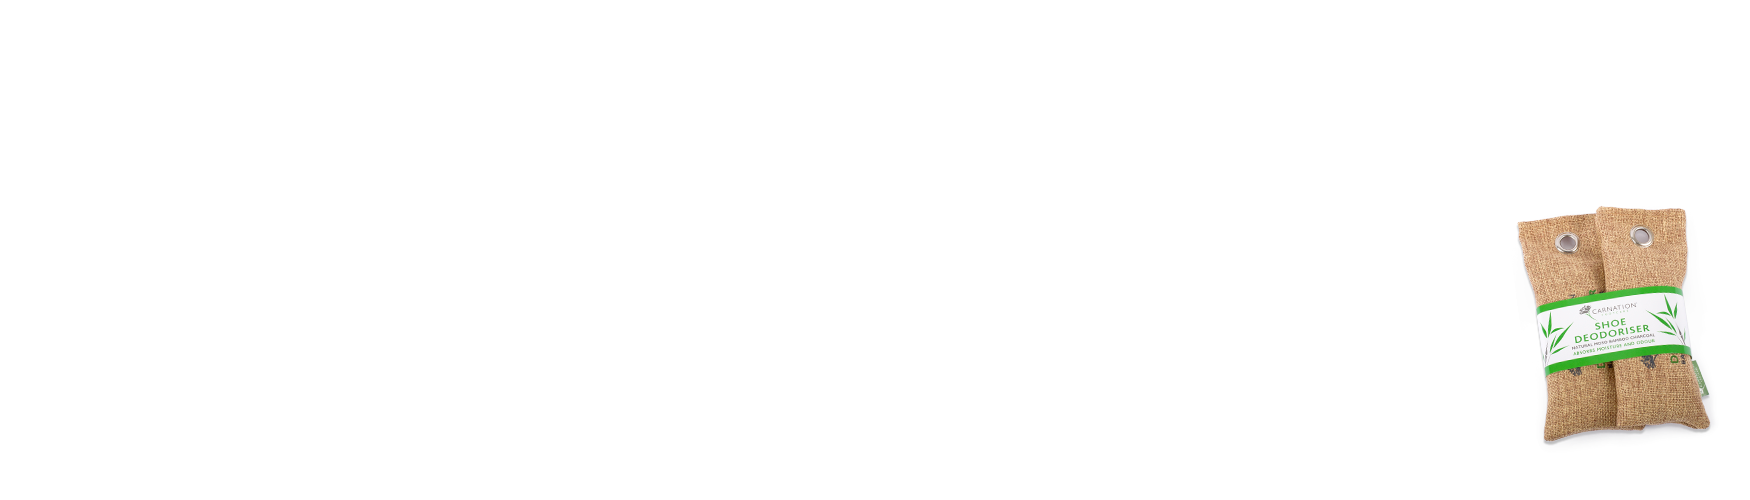 Shoe Deodoriser Slide 2